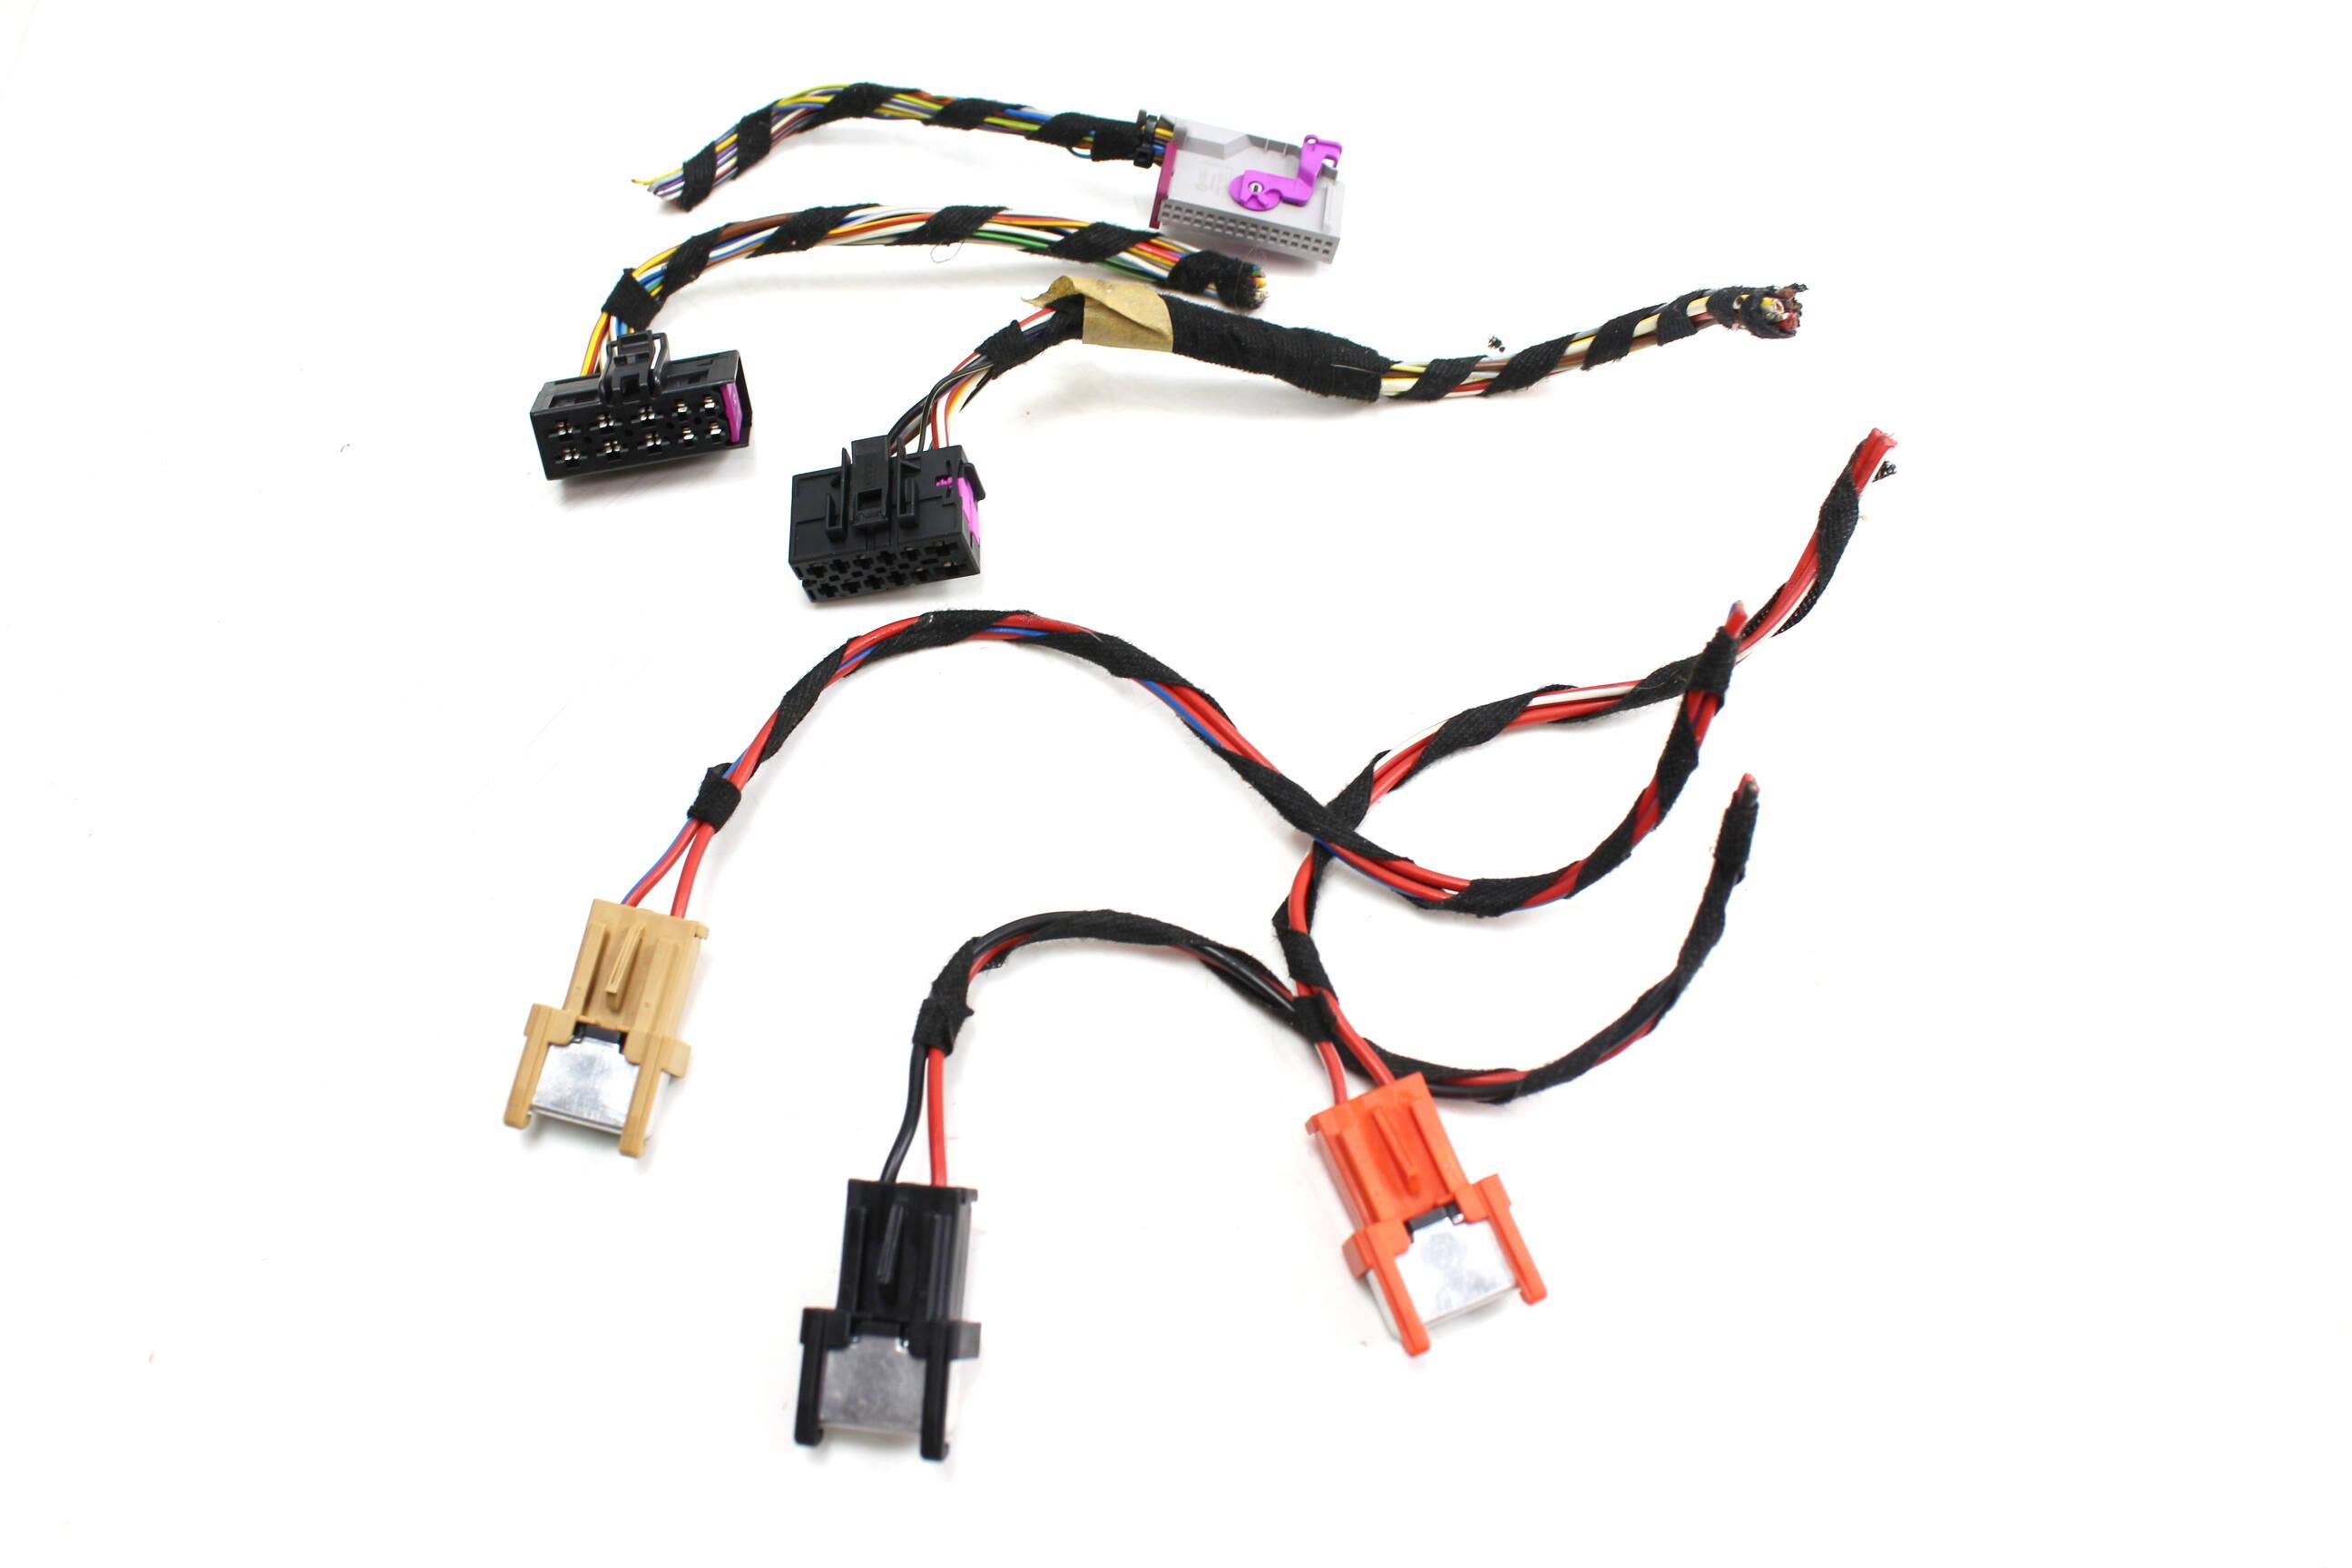 Detalles acerca de 05 06 07 08 AUDI A6 C6-módulo de suministro de on ford wiring harness, camaro wiring harness, mopar wiring harness, honda wiring harness, 2000 mustang wiring harness, vw wiring harness, saab wiring harness, toyota wiring harness, mitsubishi wiring harness, mercury wiring harness, porsche wiring harness, jayco wiring harness, 2004 mustang wiring harness, subaru wiring harness, lexus wiring harness, kymco wiring harness, hyundai wiring harness, dodge wiring harness, miata wiring harness, chrysler wiring harness,